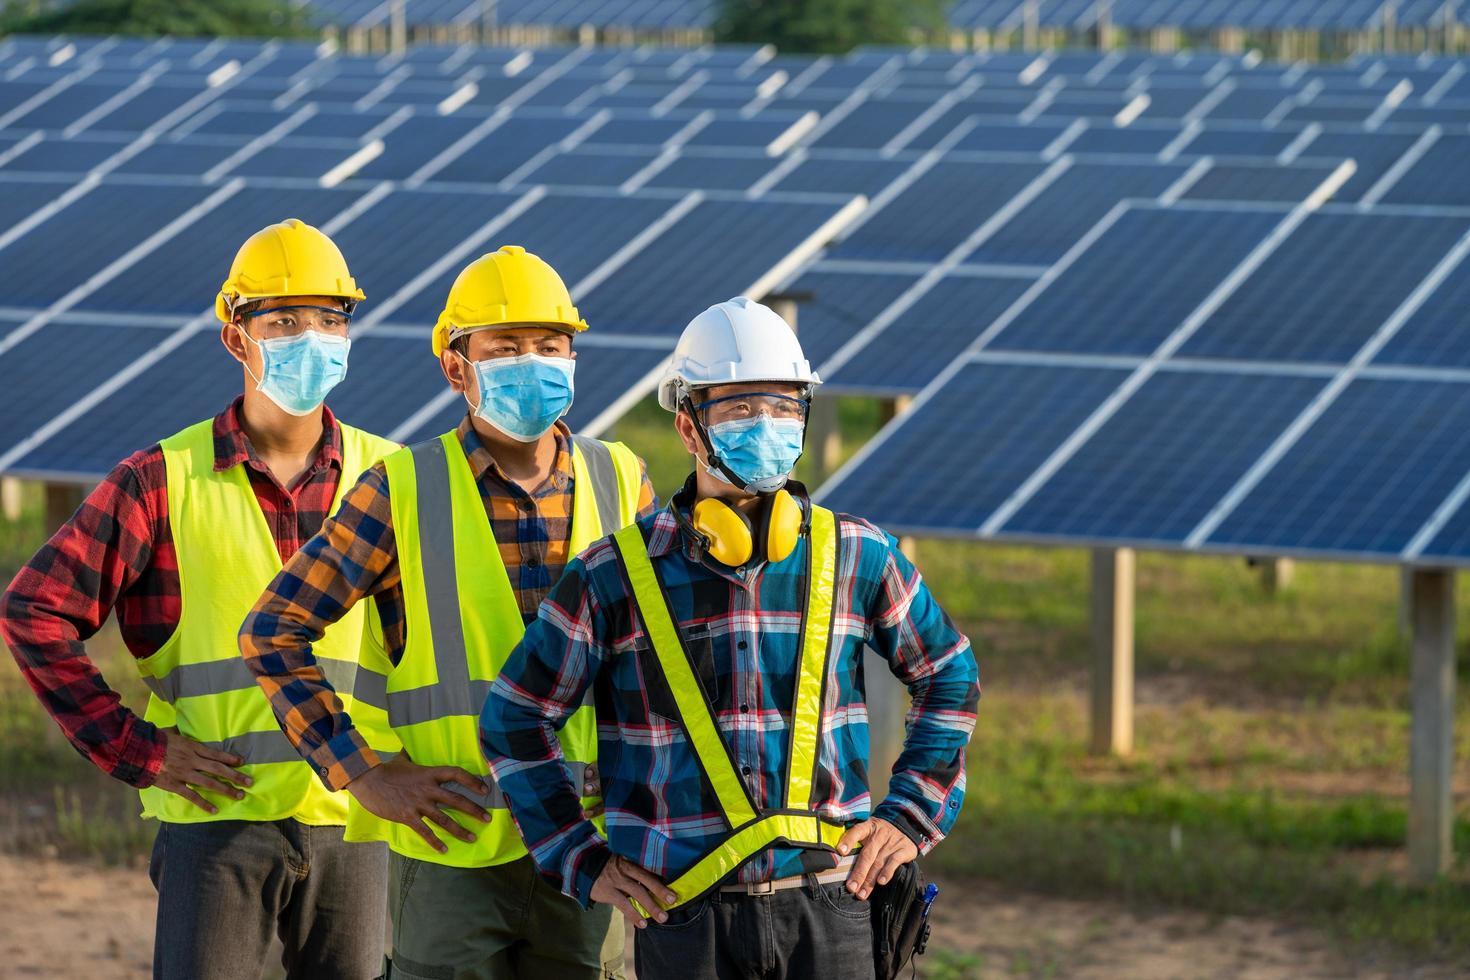 gemaskerde arbeiders naast zonnepanelen foto